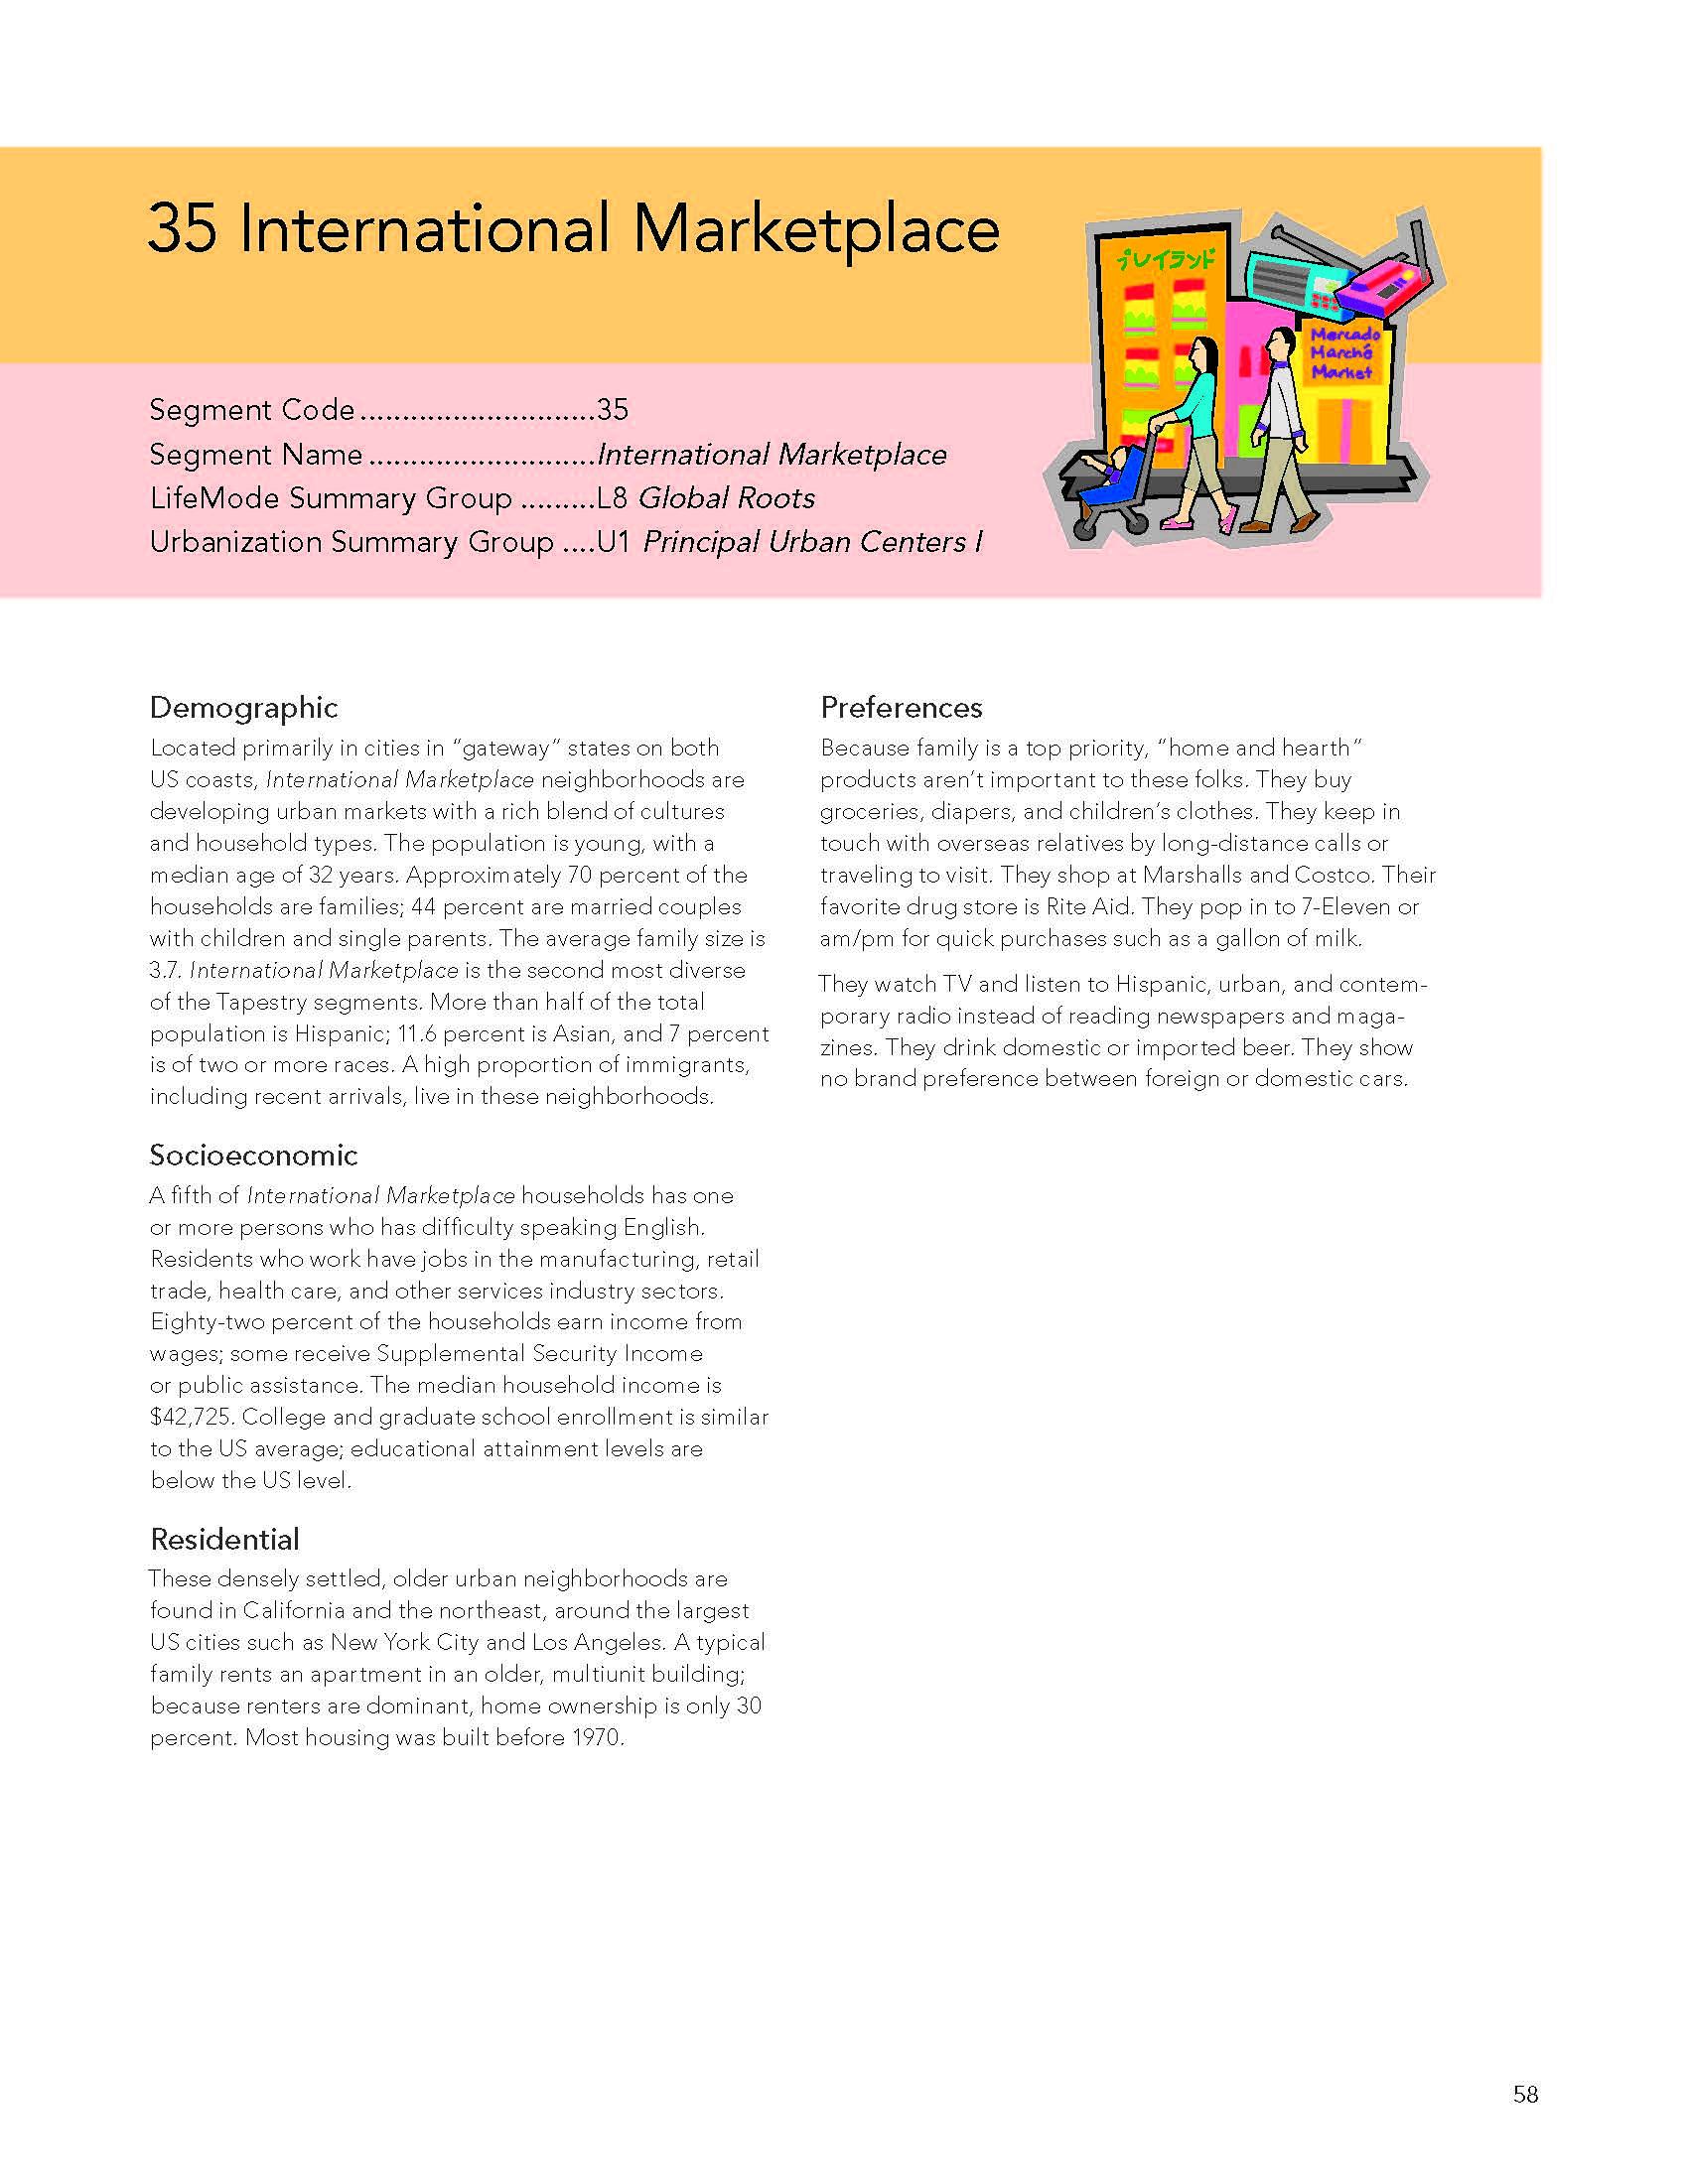 tapestry-segmentation_Page_61.jpg